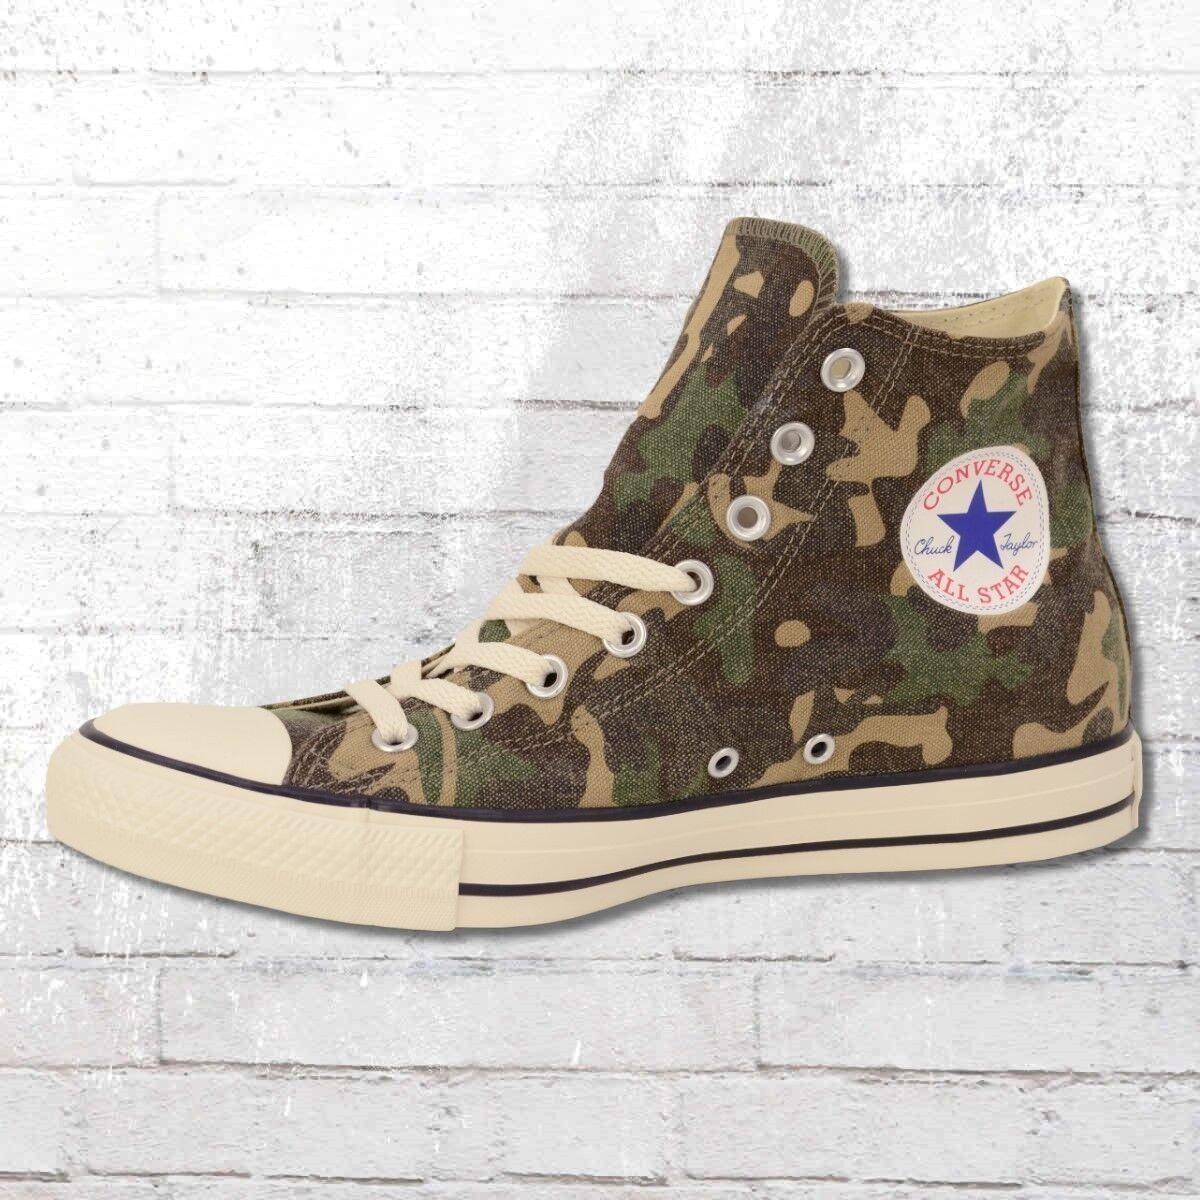 Converse Vintage Unisex Chucks CT High 152749 C Unisex Vintage Zapatos camouflage Sneaker 67a106